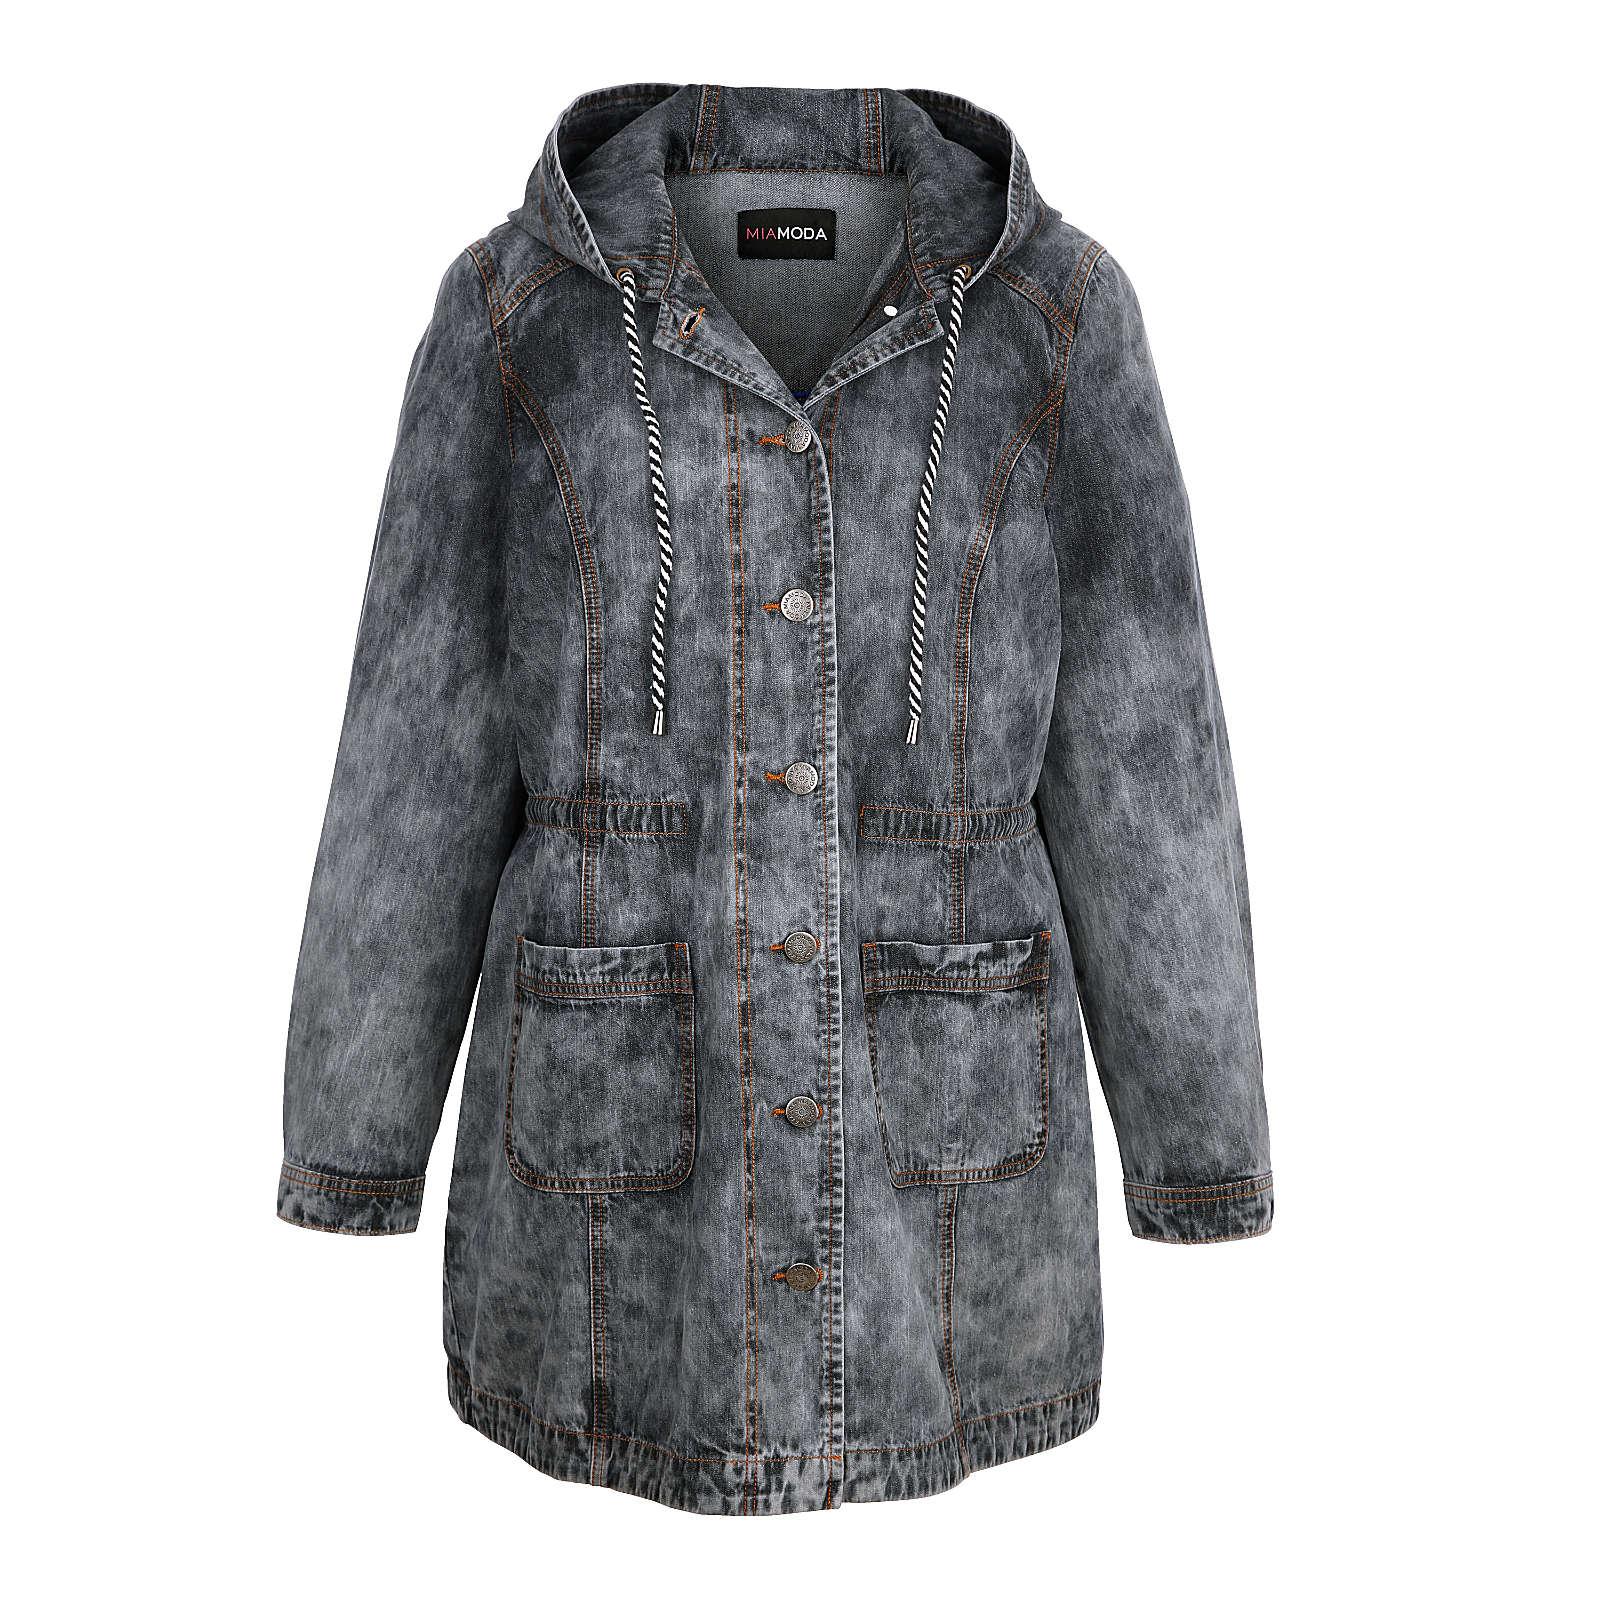 Rabatt-Preisvergleich.de - Bekleidung   Jacken   Jeansjacken a13cd82655